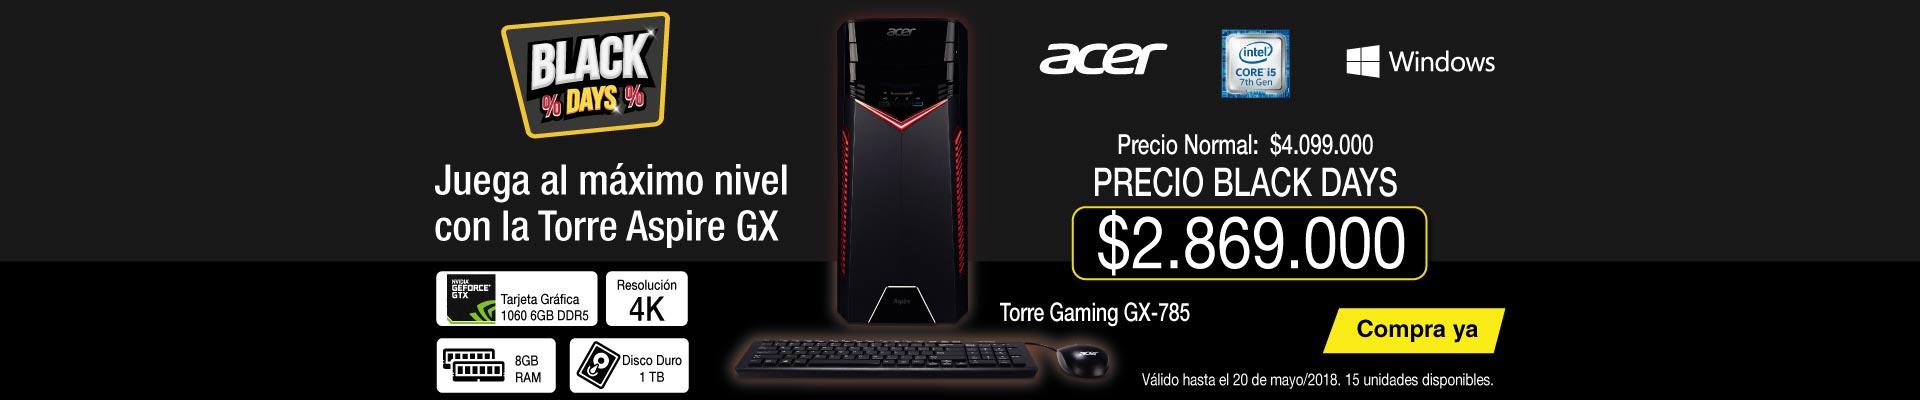 PPAL ALKP-7-tv-PC Gamer ACER - GX-785-SR11 - Intel Core i5 - Disco Duro 1TB - Negro-prod-Mayo18-20